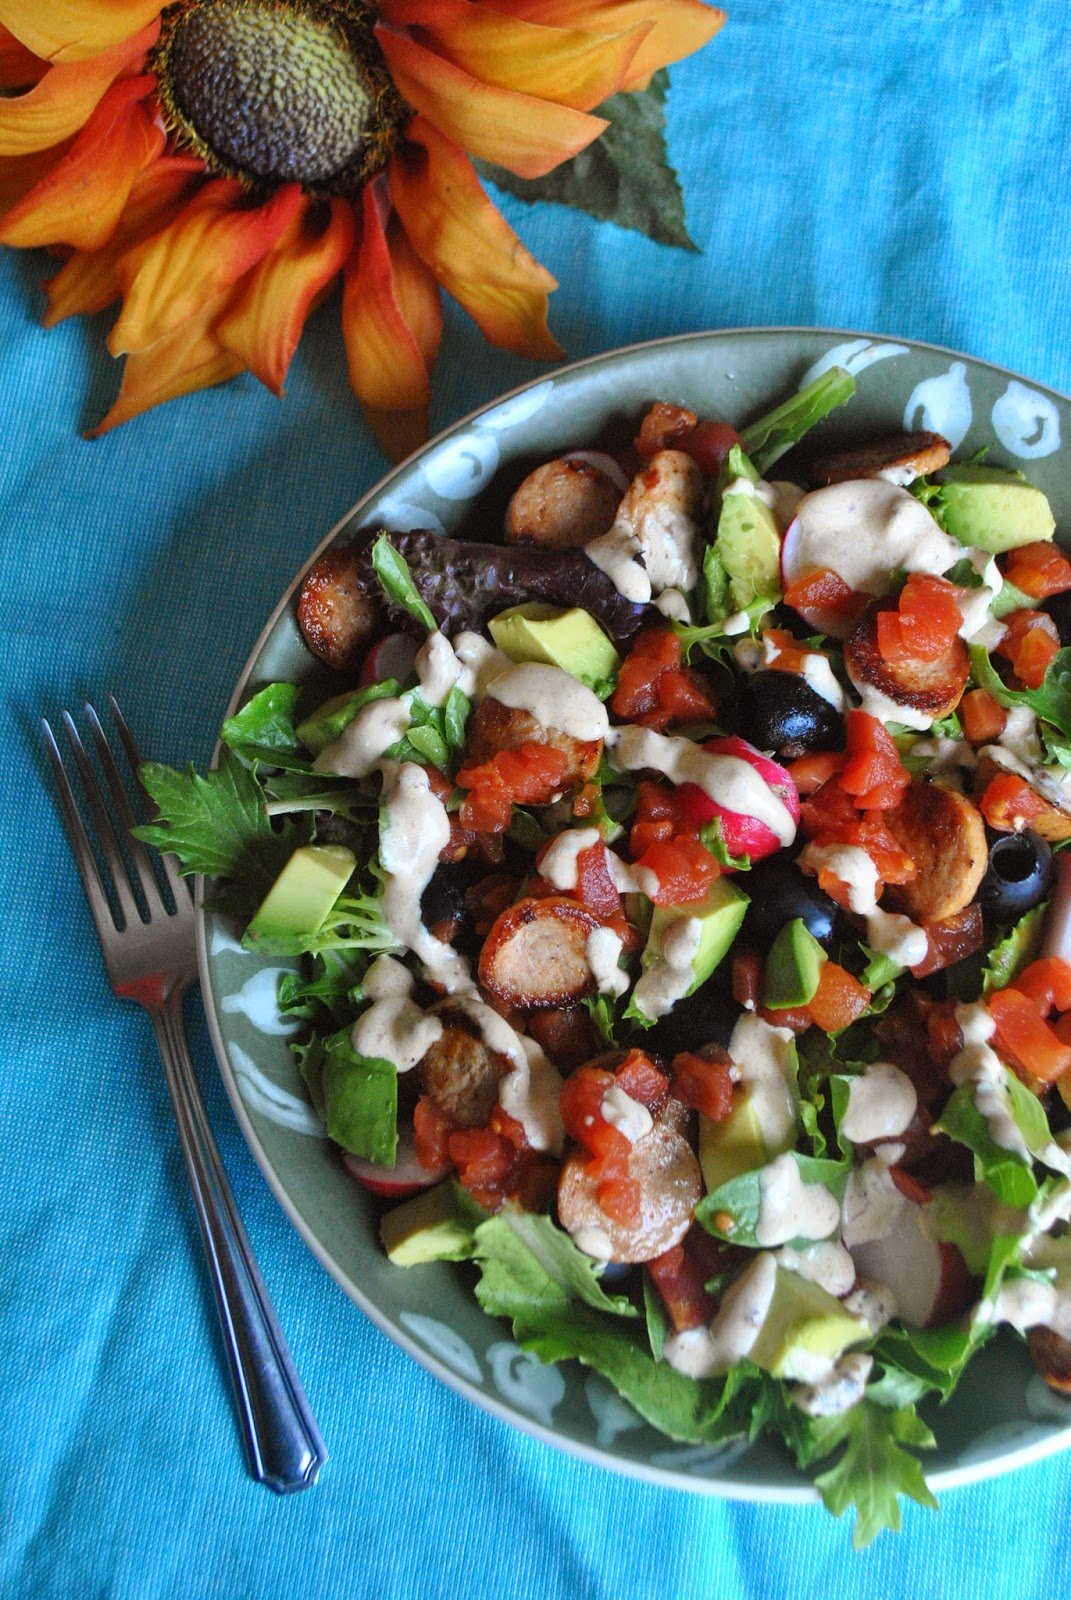 creamy chipotle salad